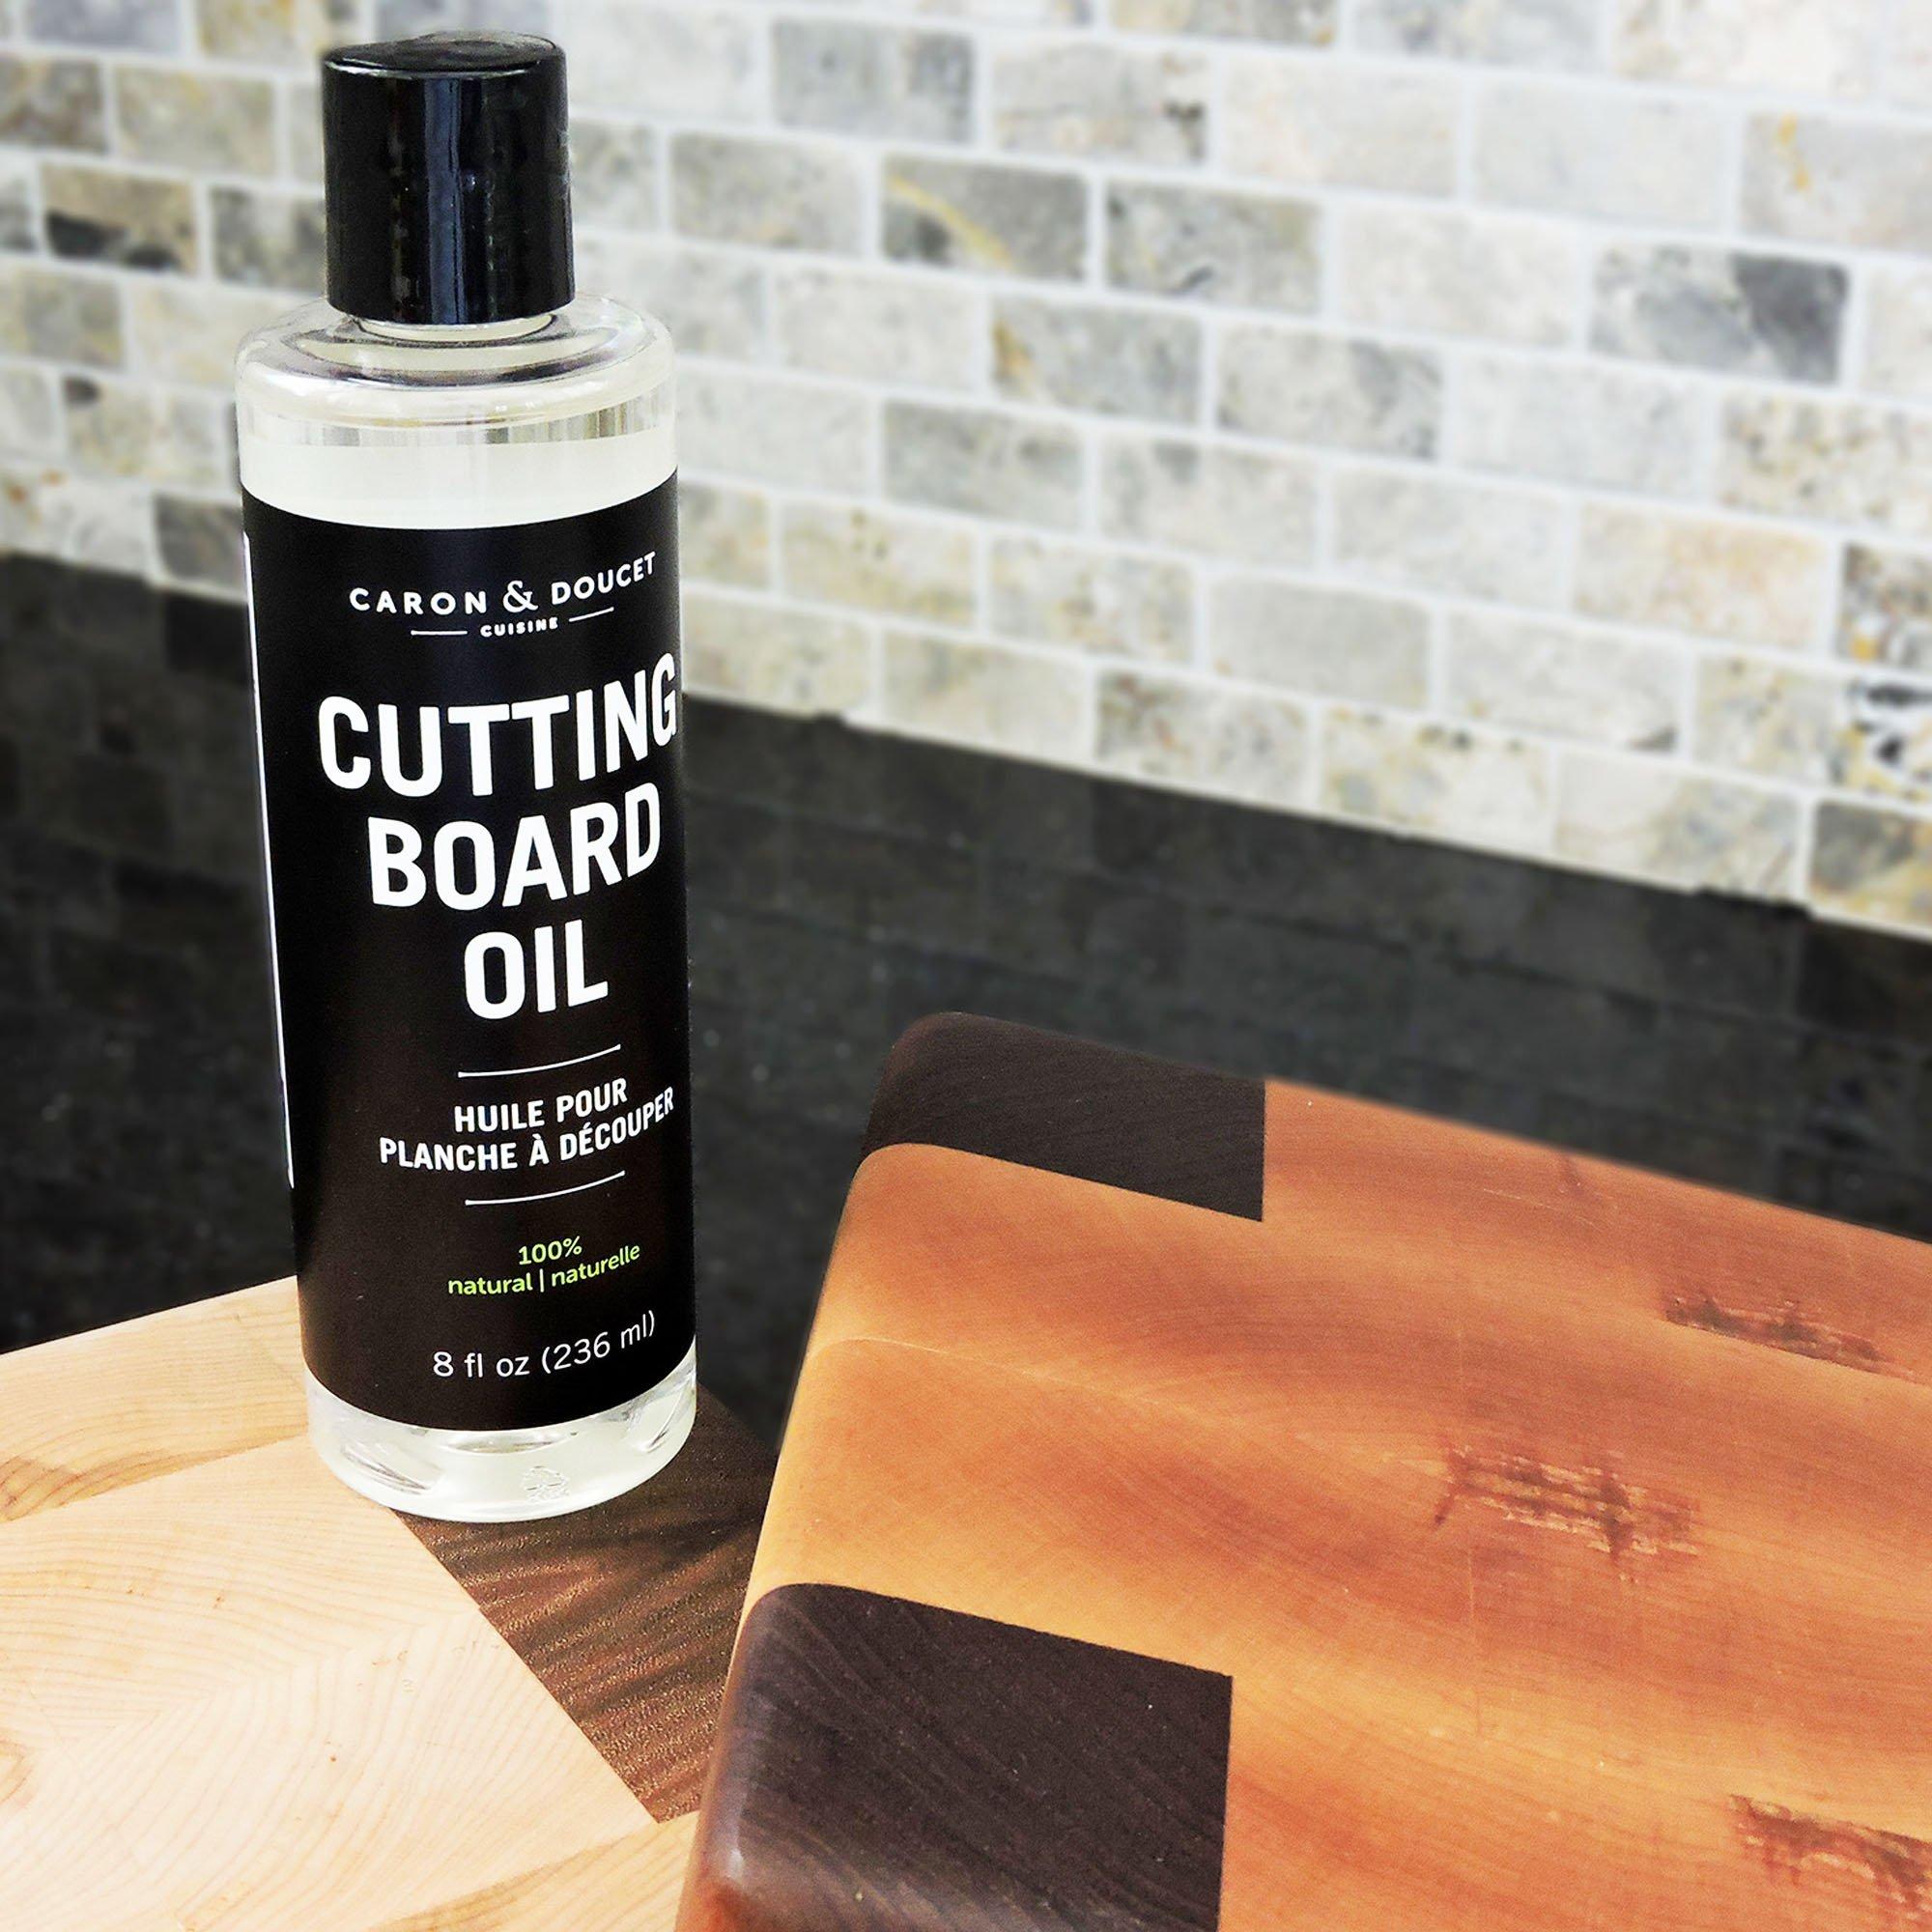 Caron & Doucet - Cutting Board & Butcher Block Bundle: 2 items - 1 Cutting Board & Butcher Block Oil, 1 Cutting Board & Butcher Block Wax. 100% Plant Based (8oz Bullet) by Caron Doucet Cuisine (Image #5)